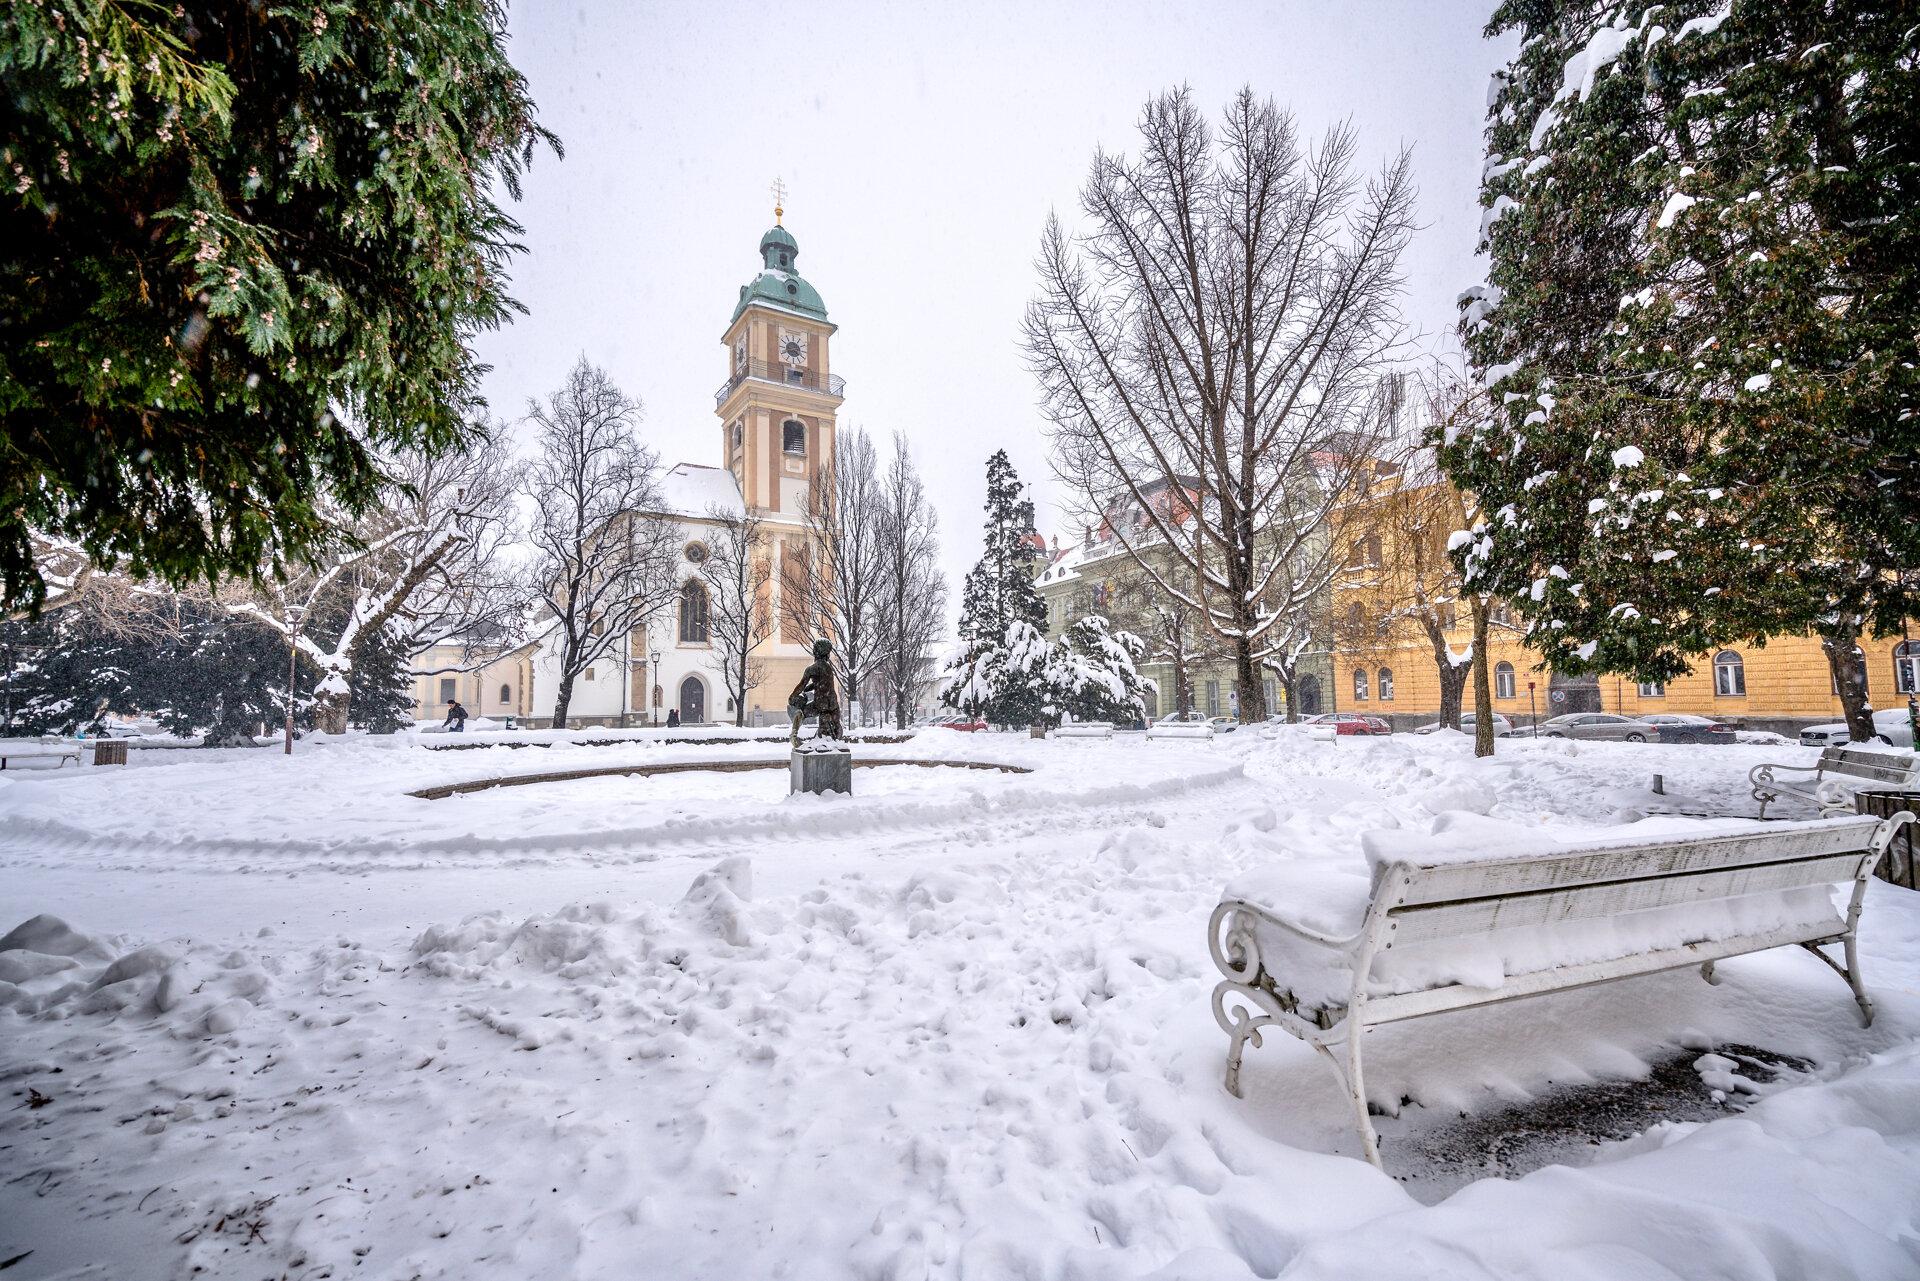 Zimski_Maribor_Unuk_17.jpg